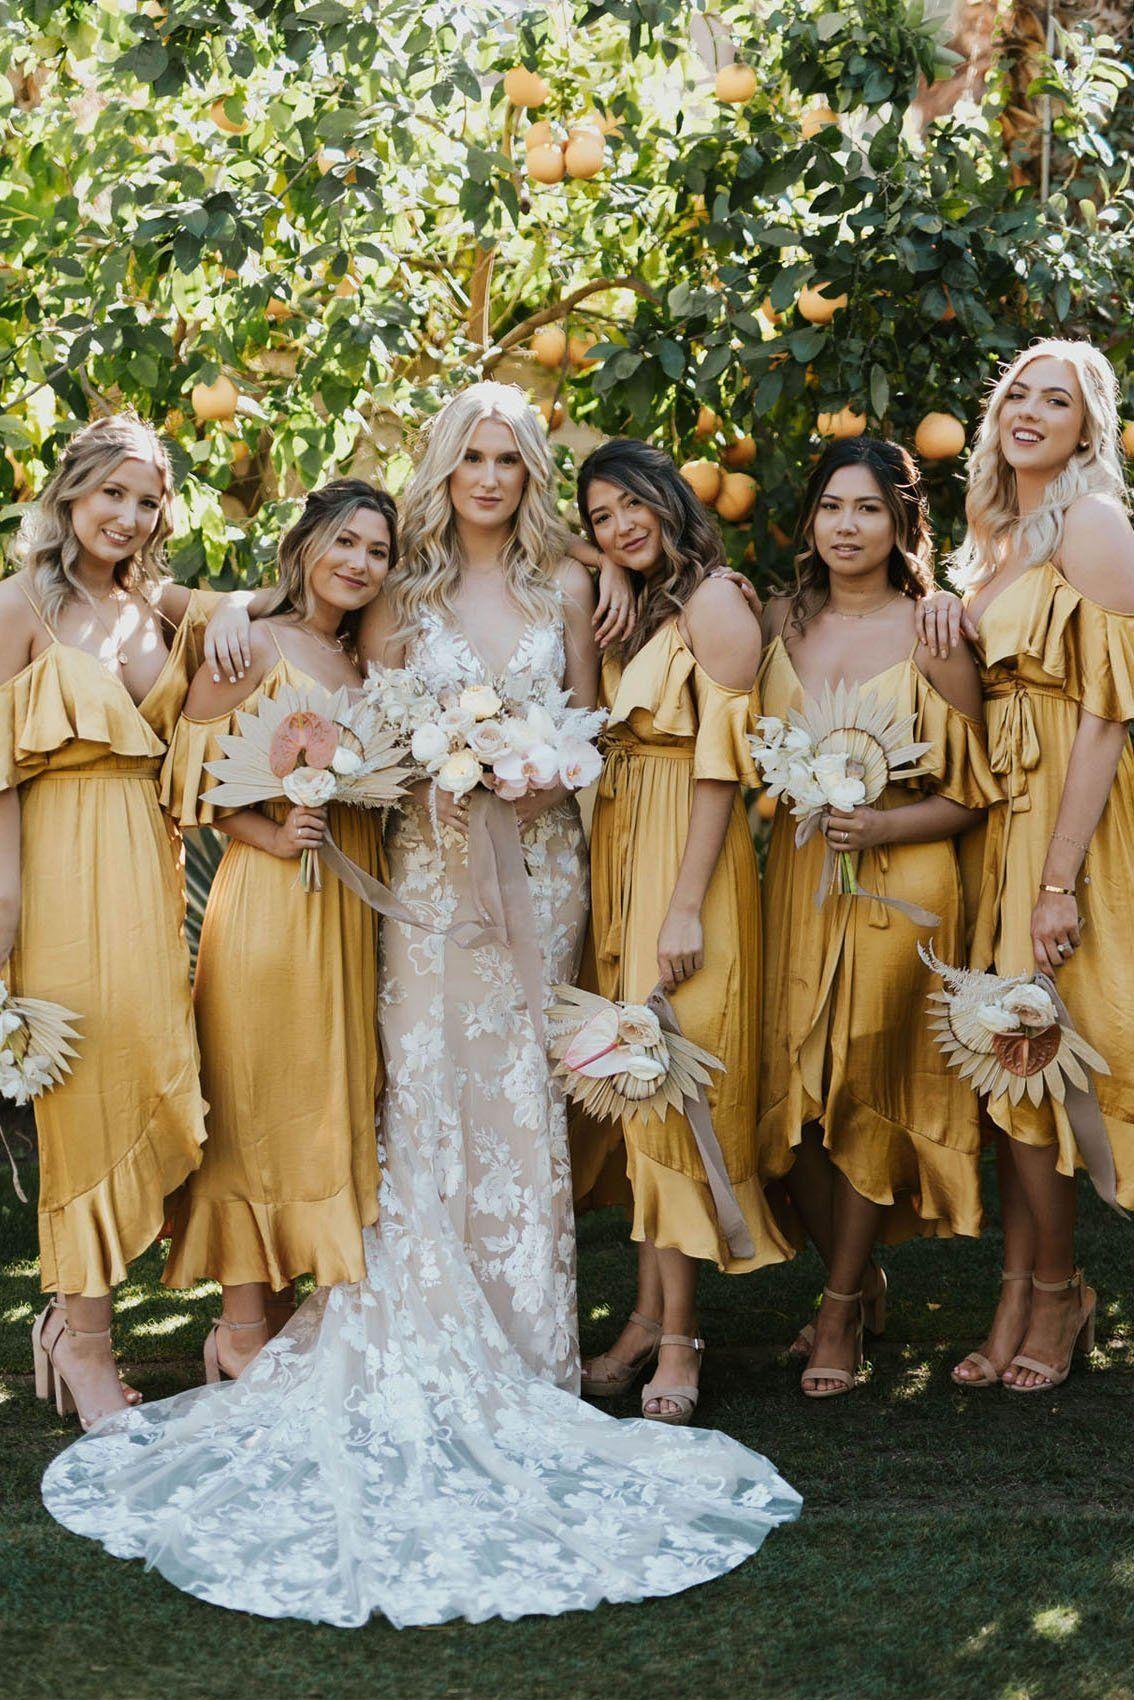 Yellow V Neck Spaghetti Straps High Low Bridesmaid Dresses Wedding Party Dresses BD1017